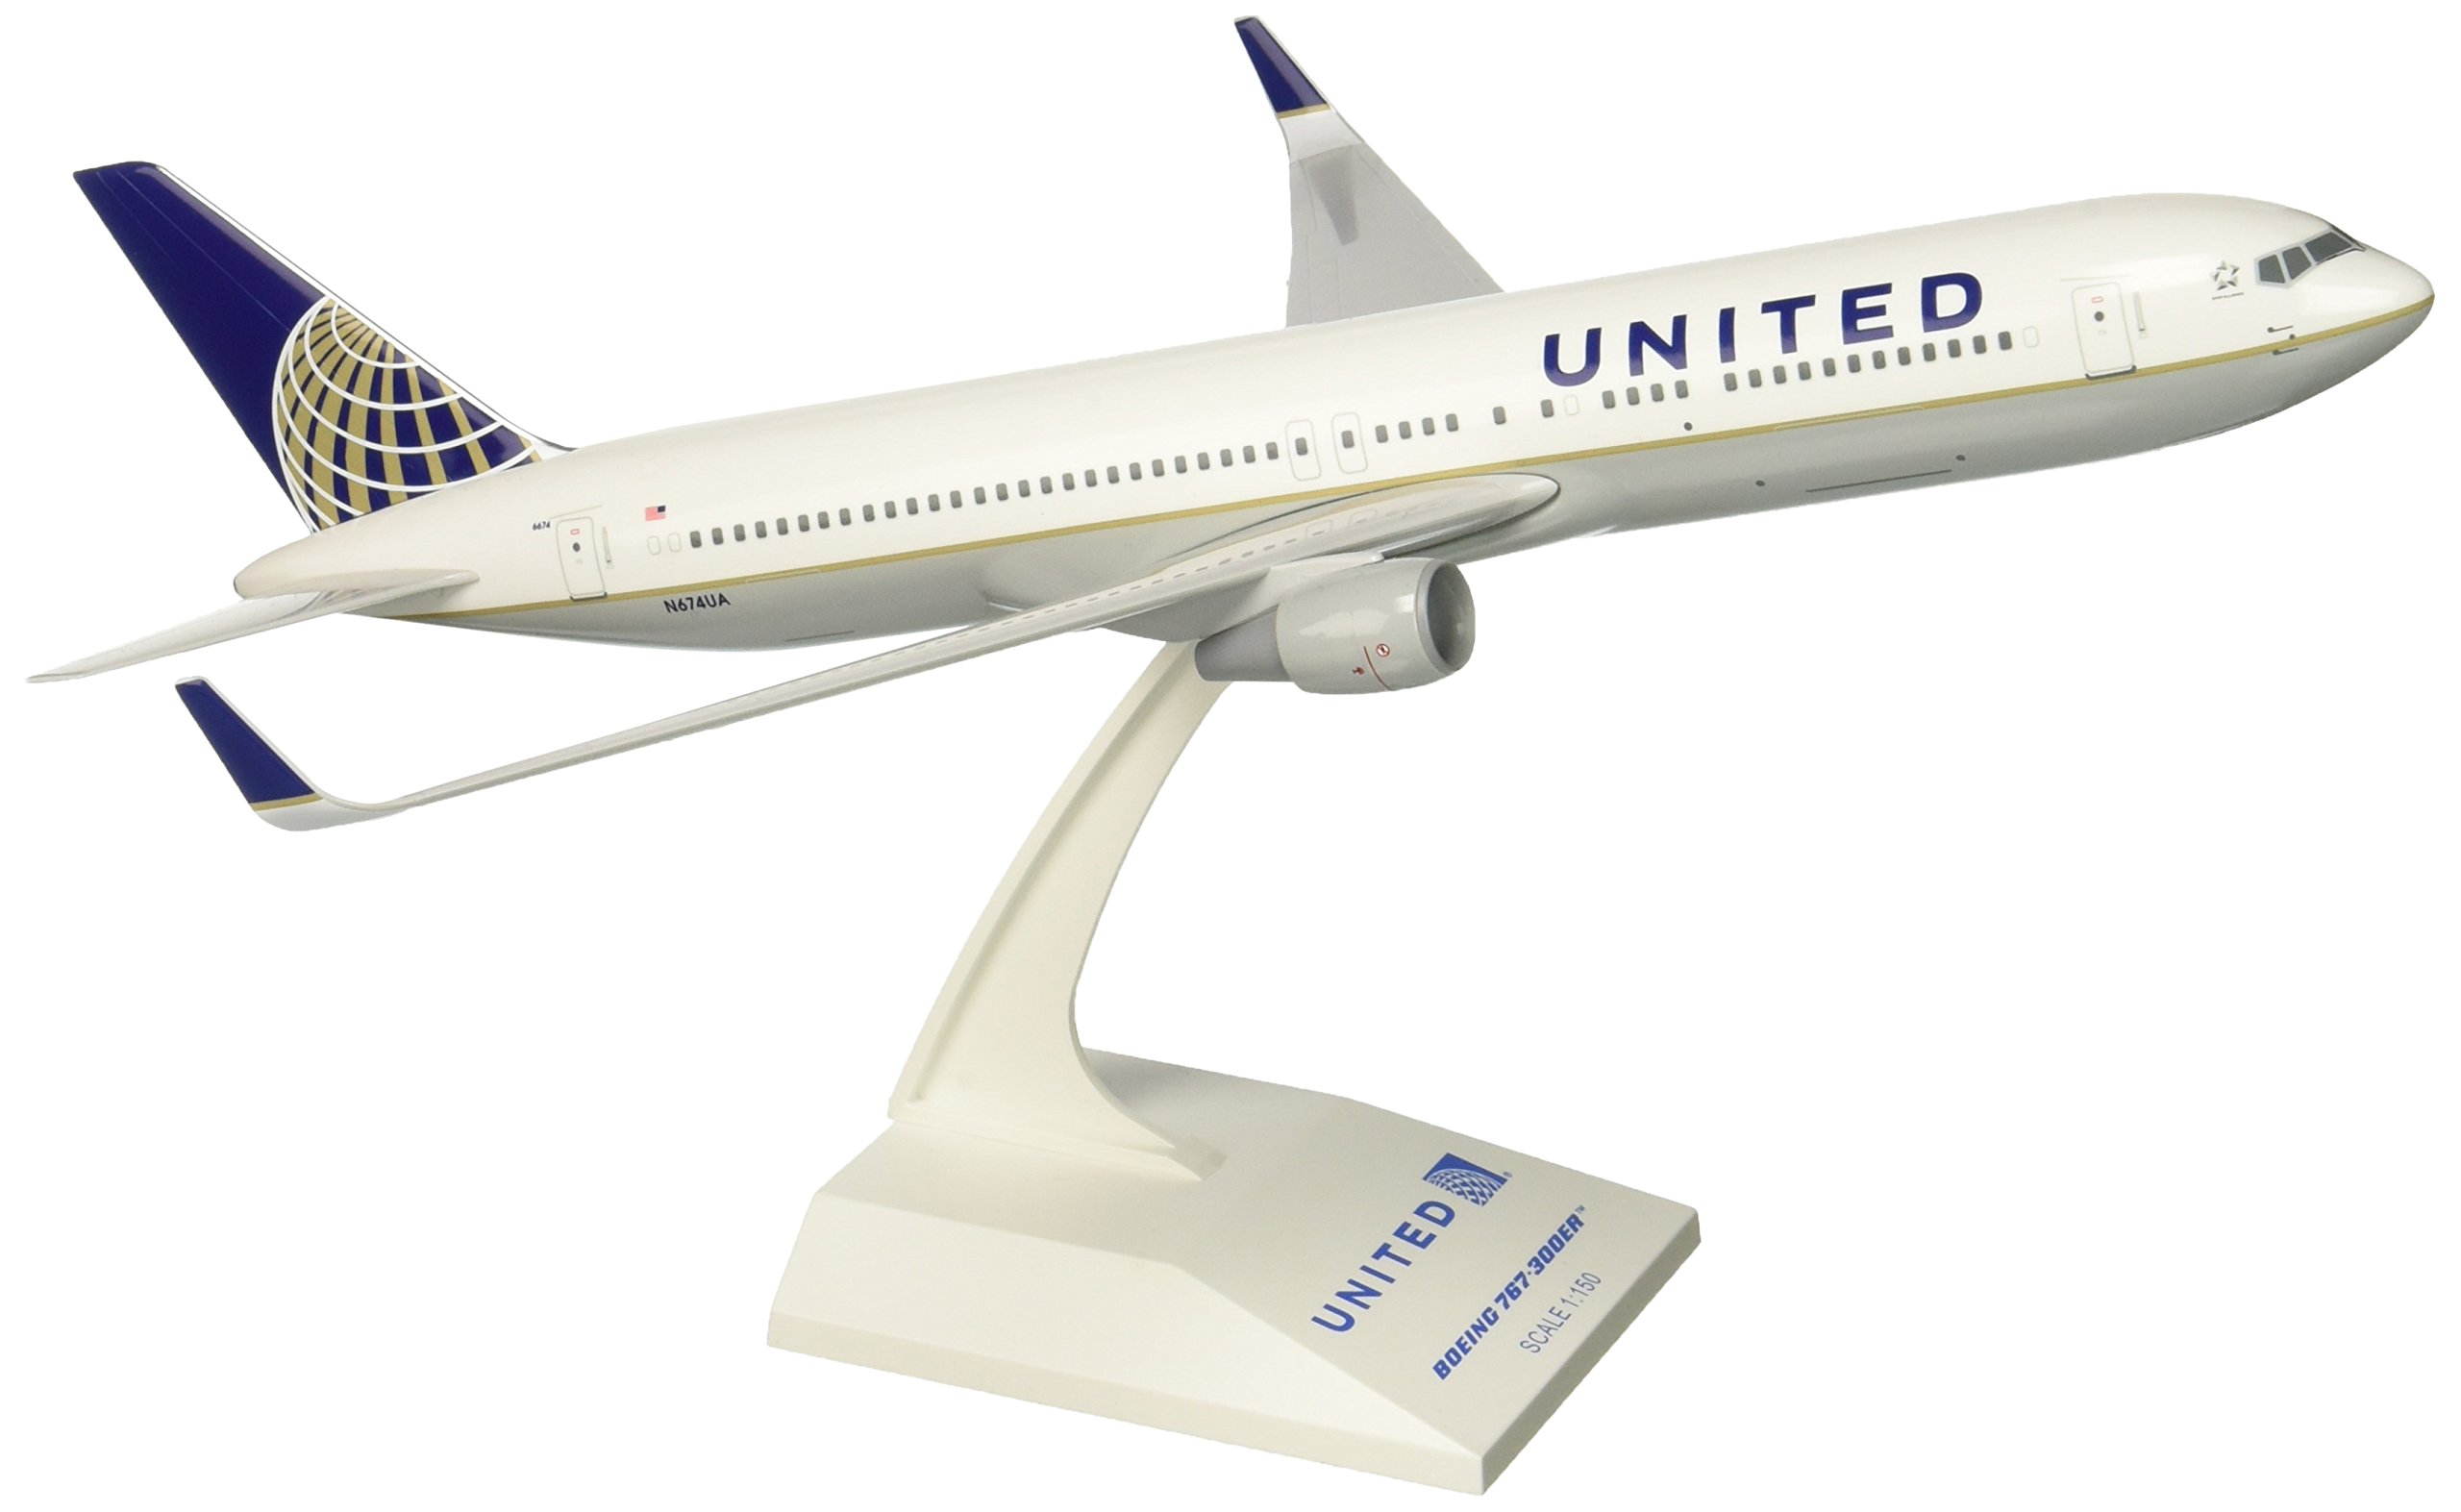 Daron Skymarks United 767-300ER Post Co Merger Liv Model Kit (1/150 Scale) by Daron (Image #1)